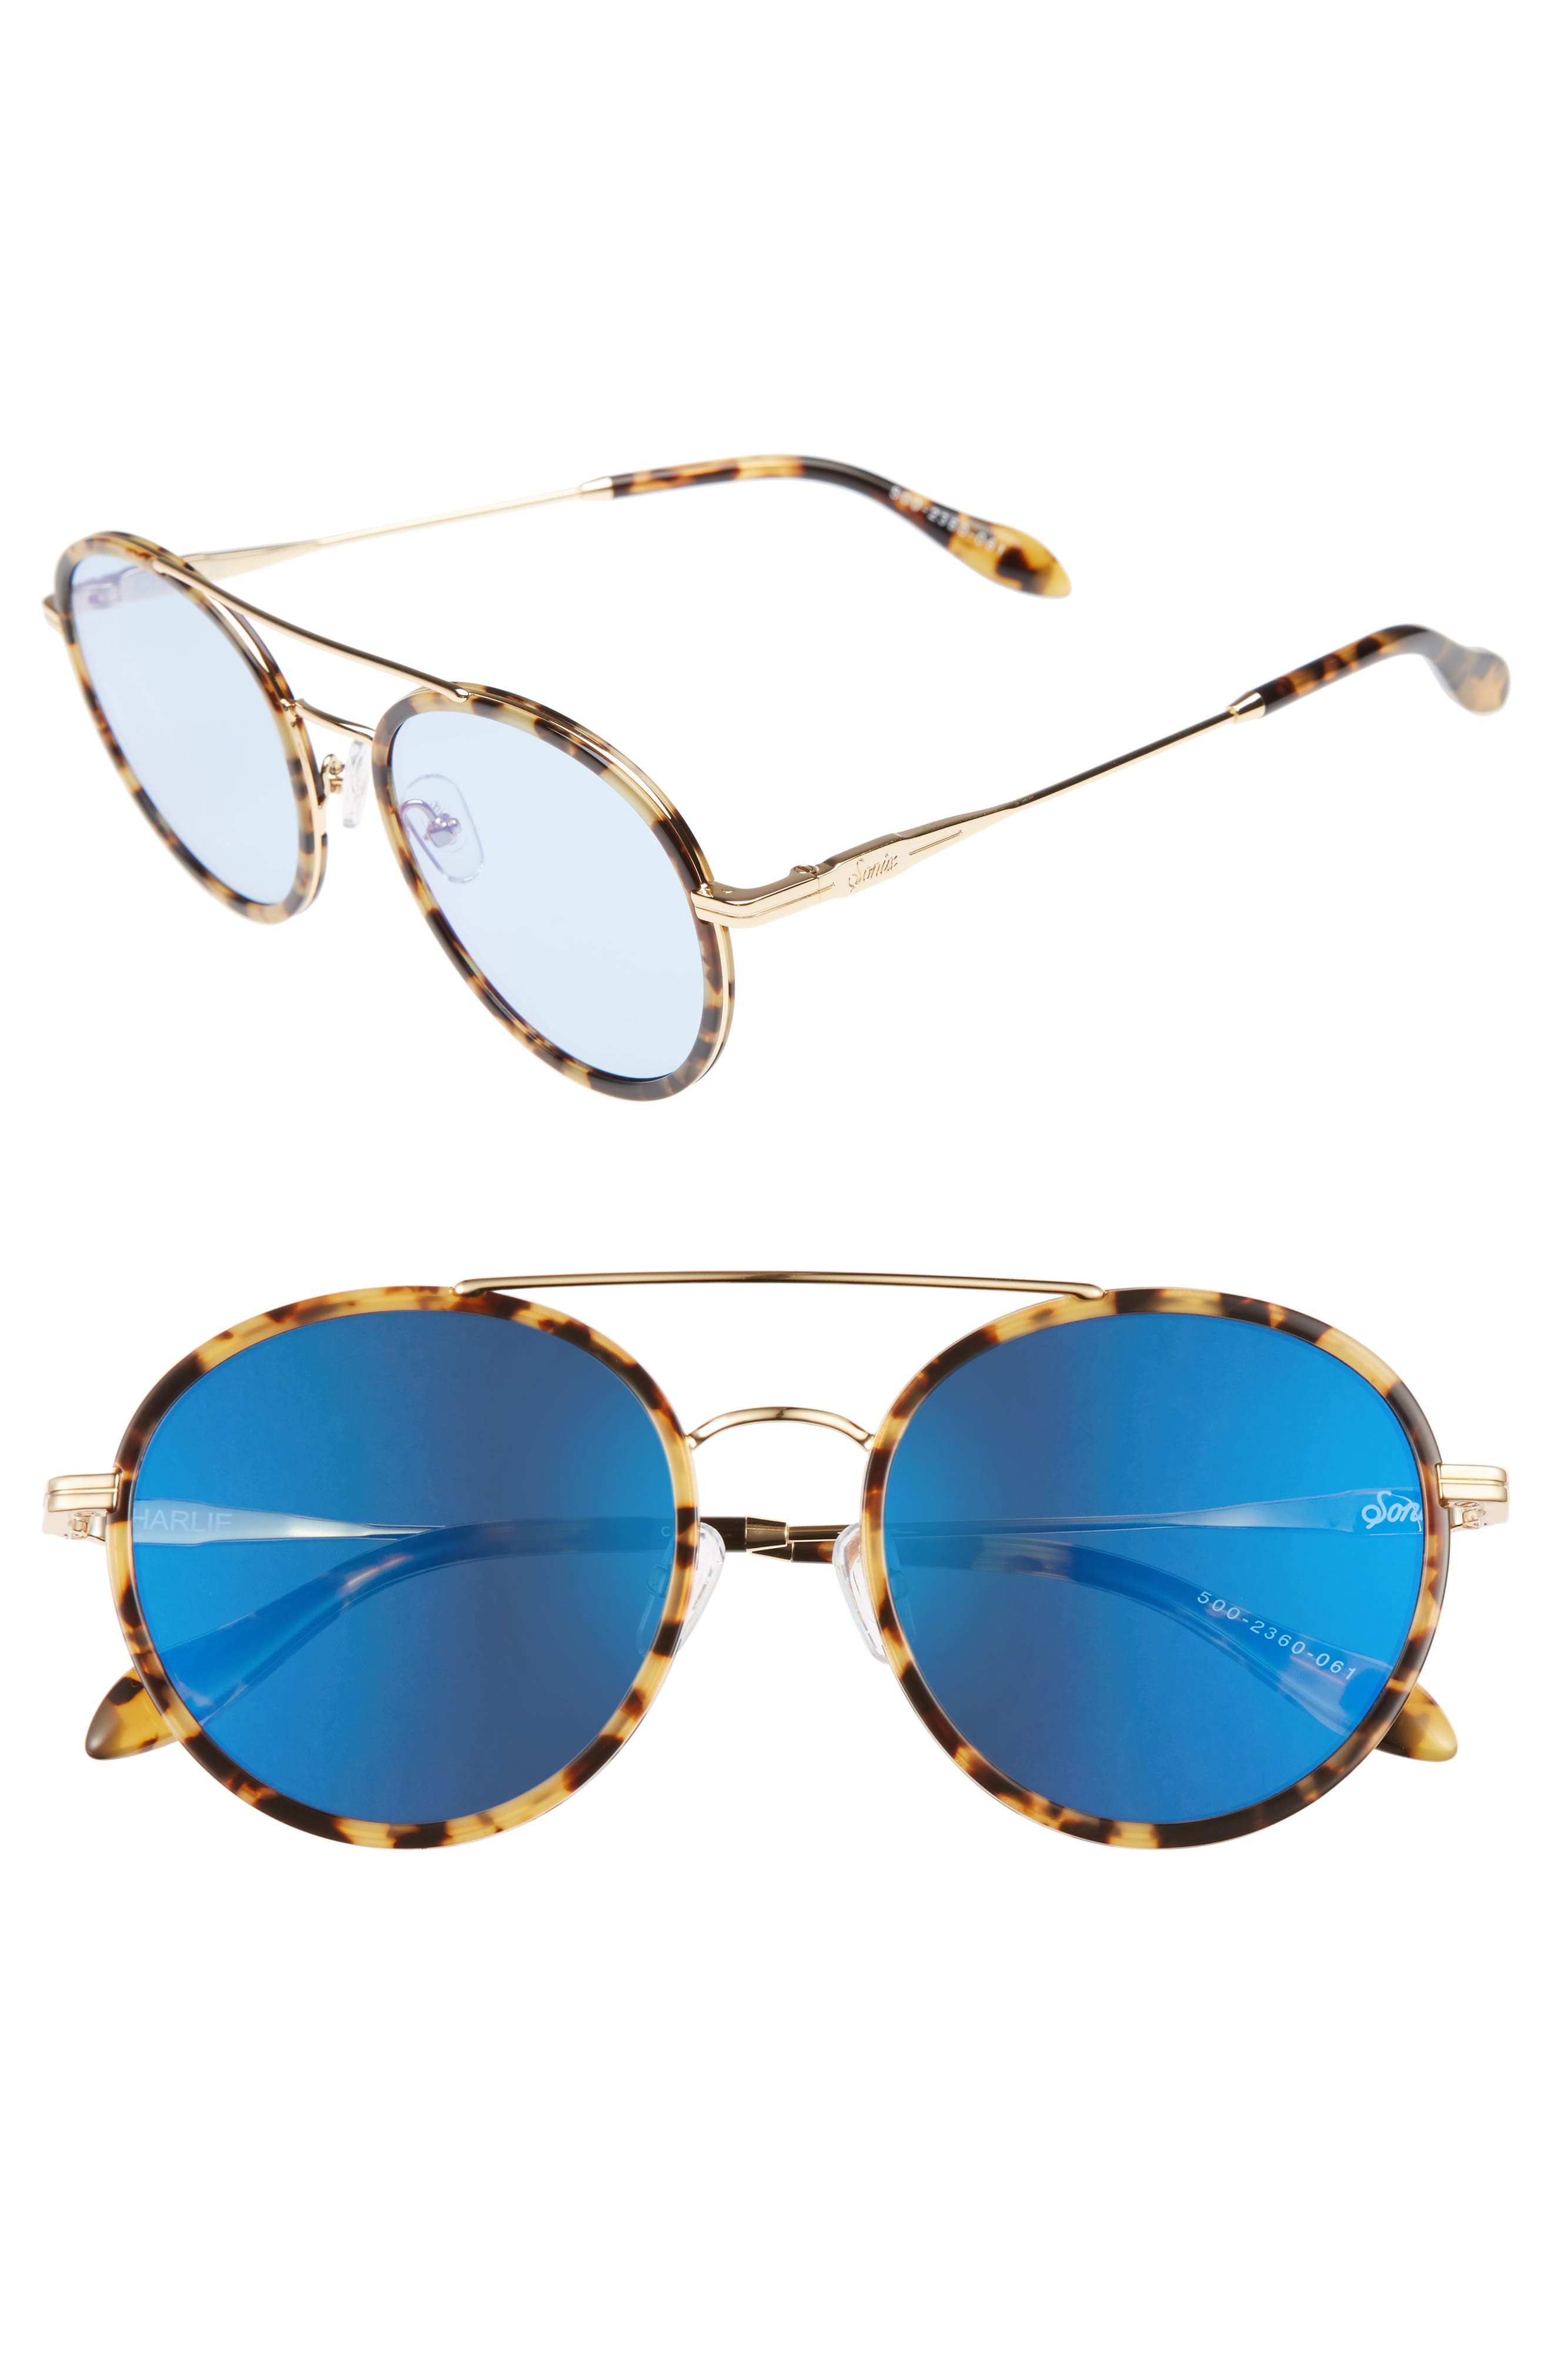 Charli 50mm Mirrored Lens Round Sunglasses,                             Main thumbnail 2, color,